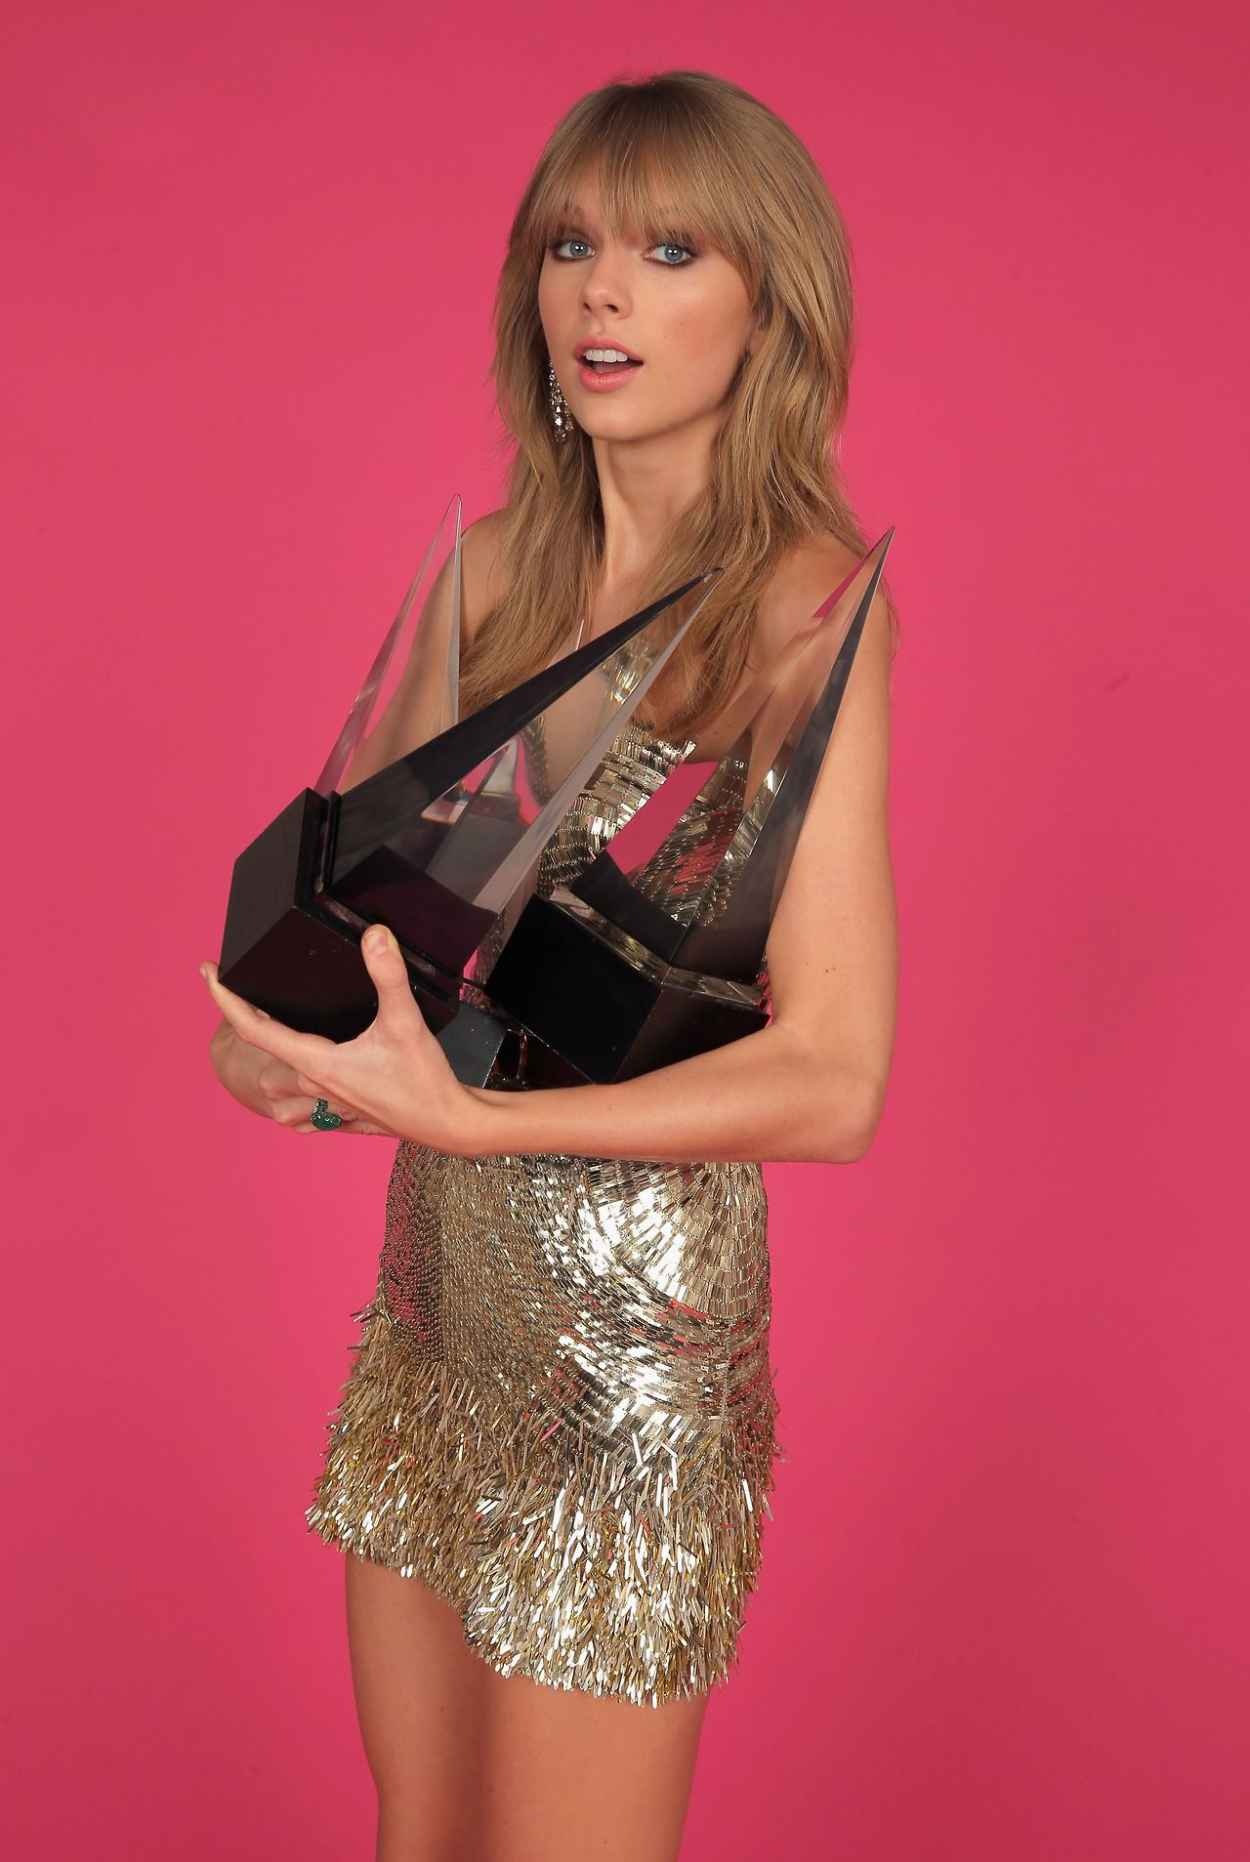 Taylor swift fearless instrumental mp3 download